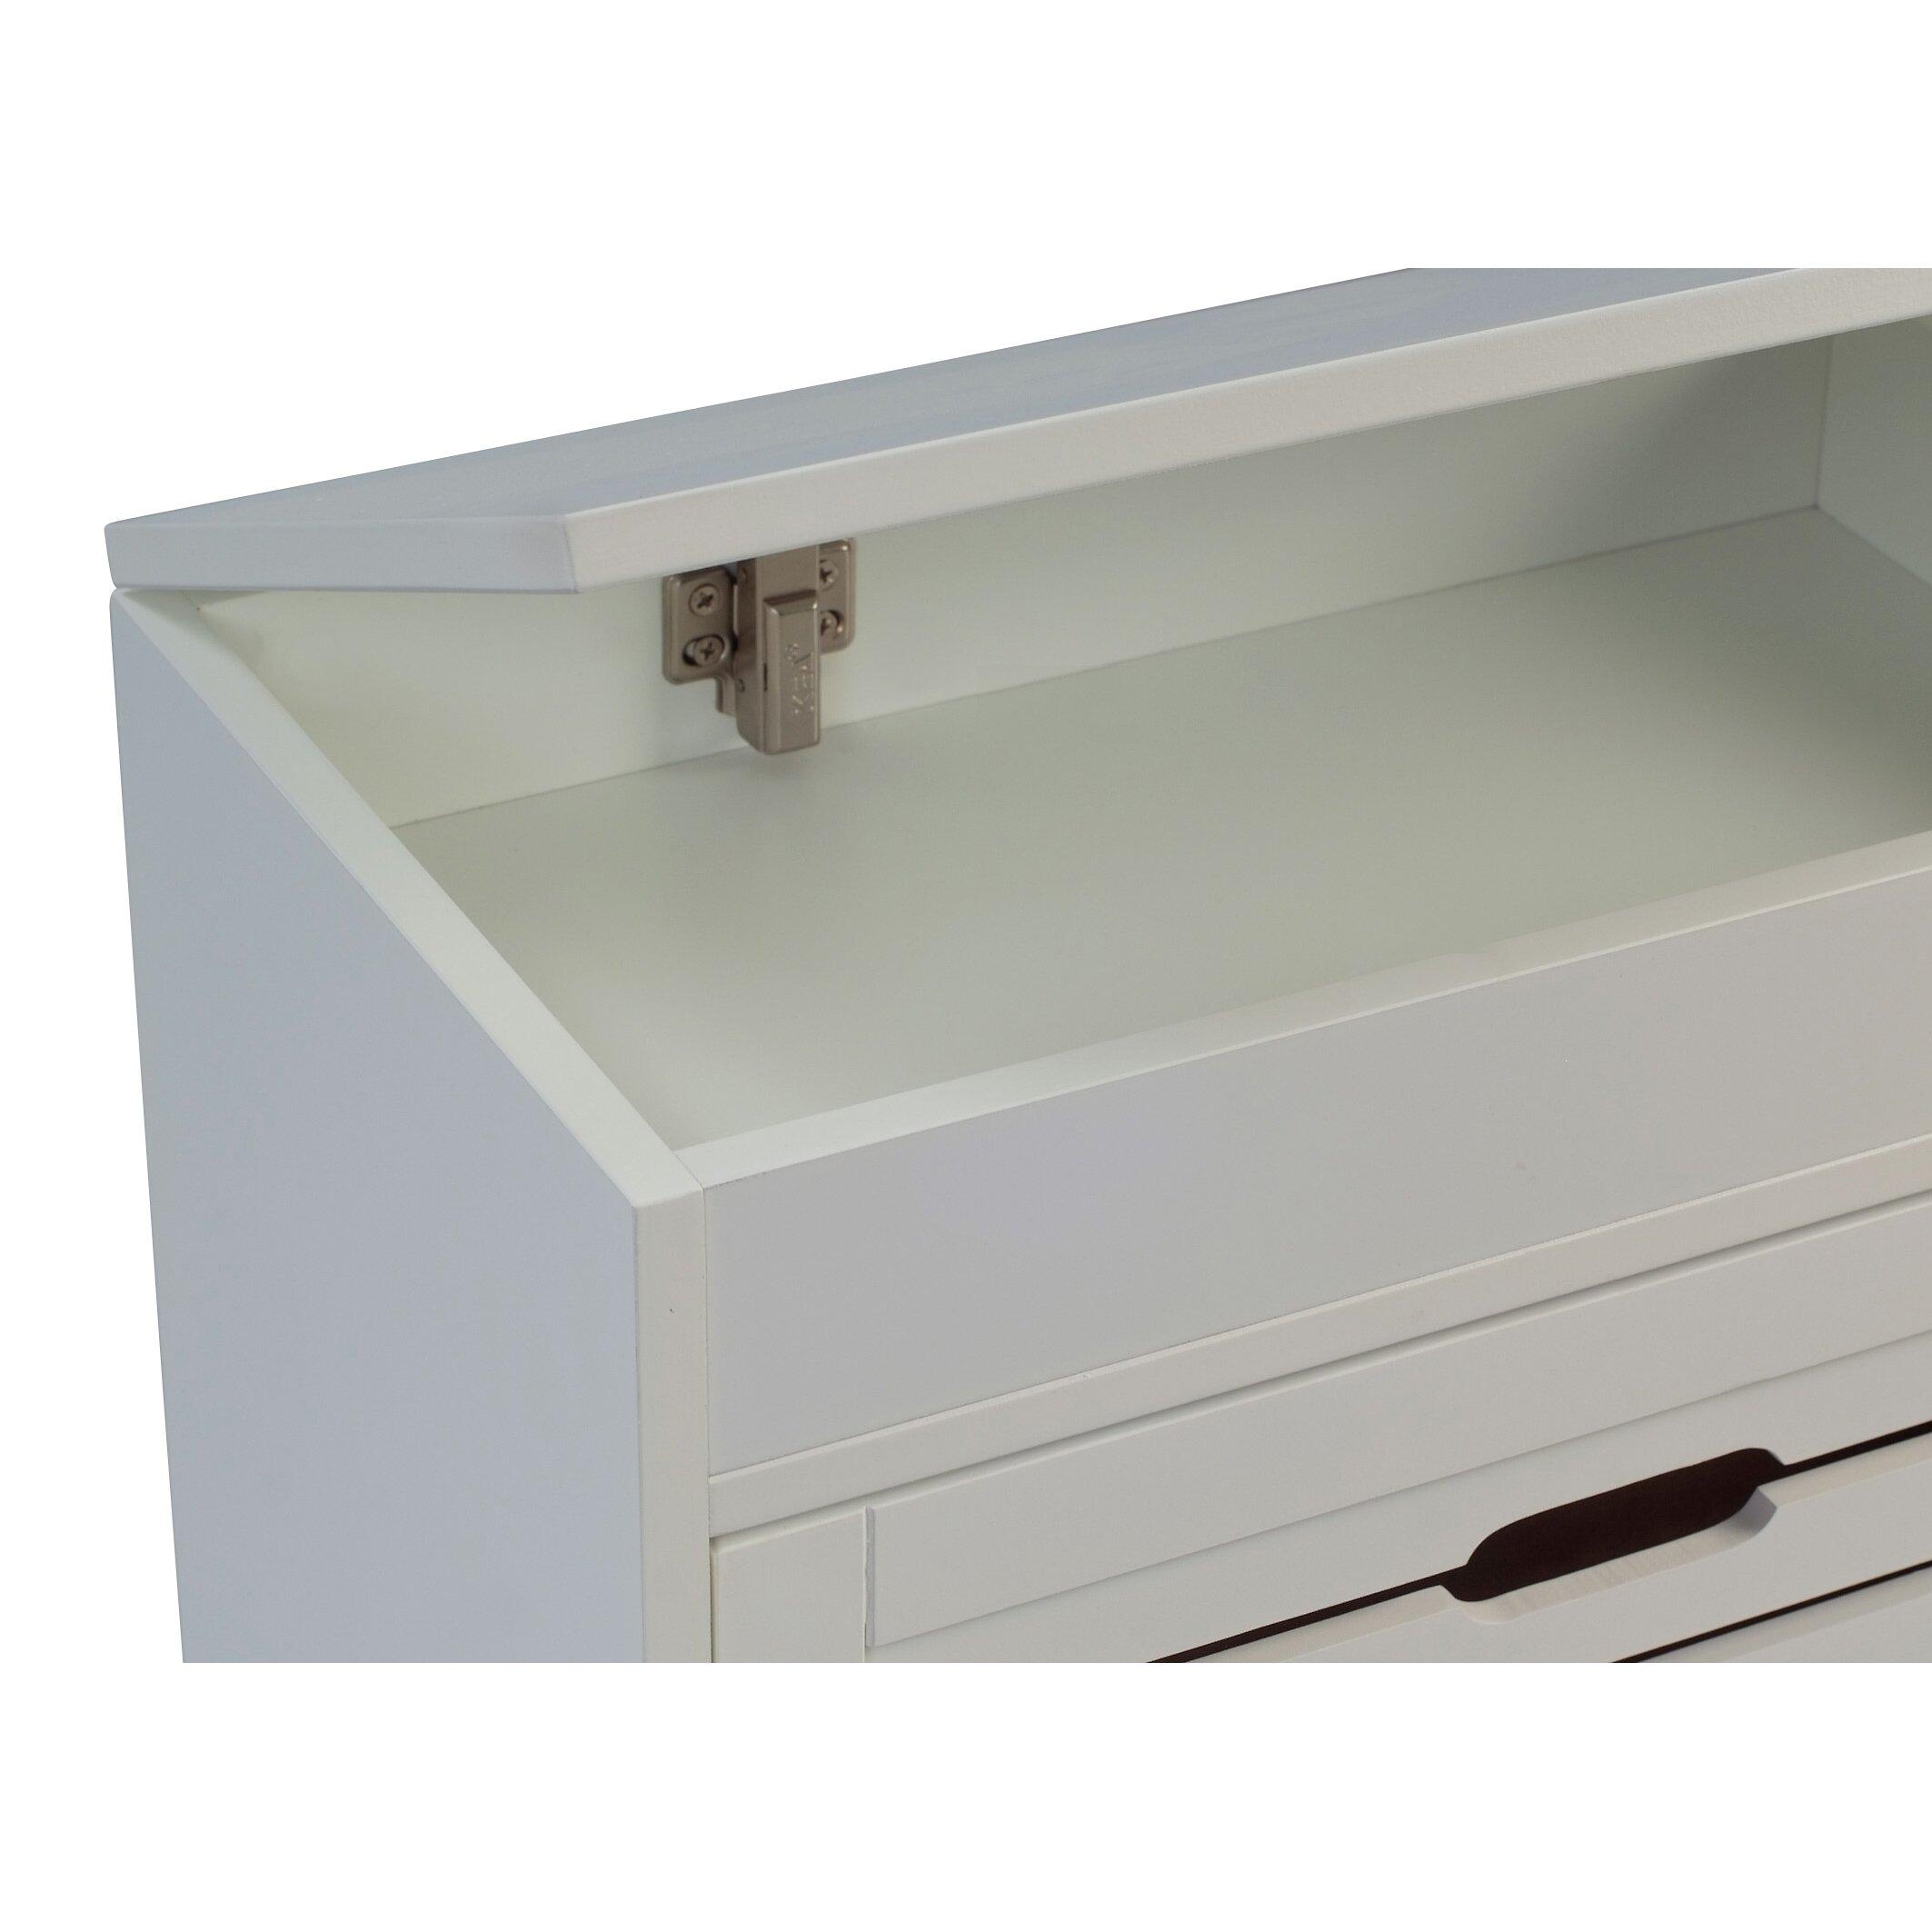 schuhschrank wandmontage urban designs schuhschrank fr paare u. Black Bedroom Furniture Sets. Home Design Ideas